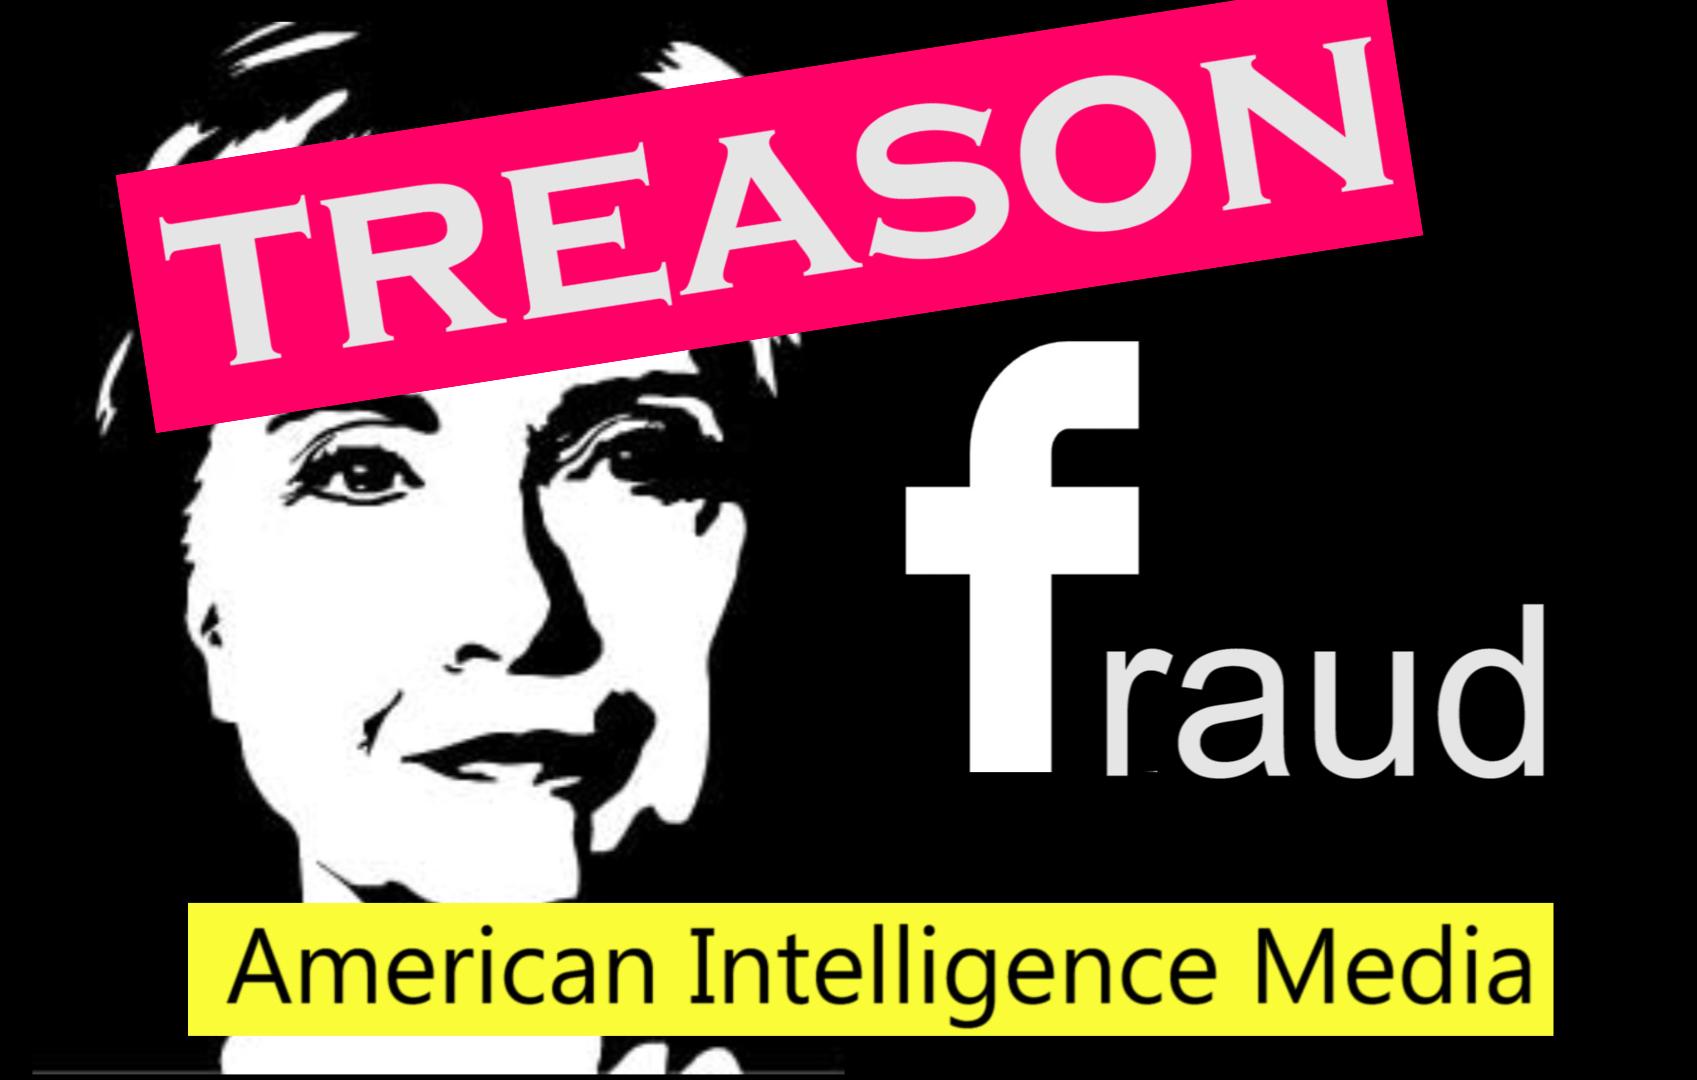 http://aim4truthblog.files.wordpress.com/2017/10/hillary-treason.jpg